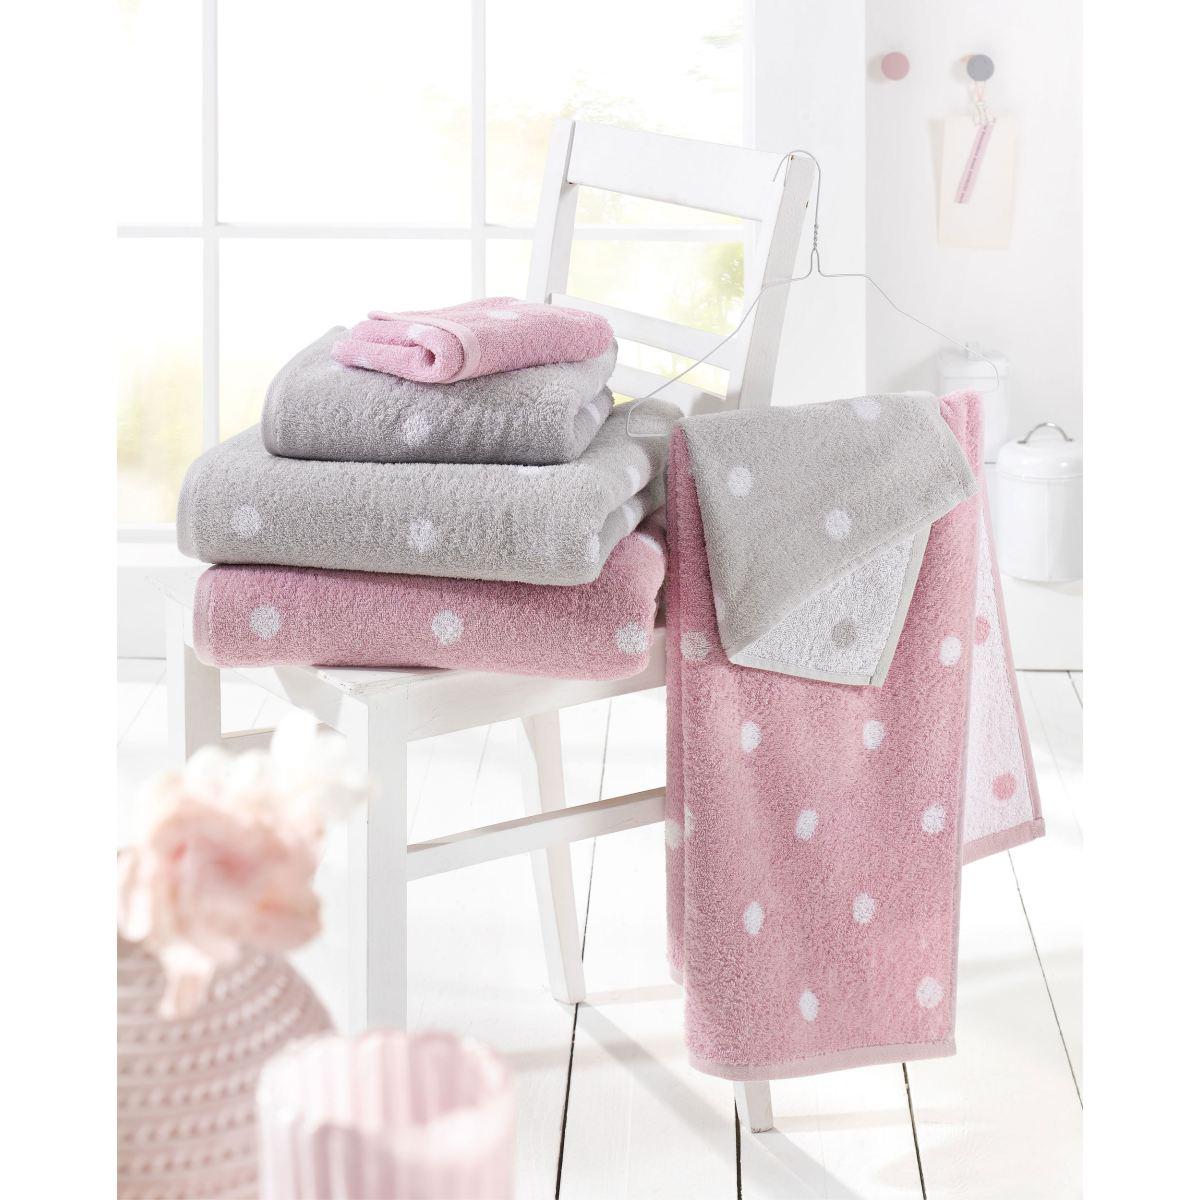 casanova handtuch punkte silber porta porta m bel. Black Bedroom Furniture Sets. Home Design Ideas